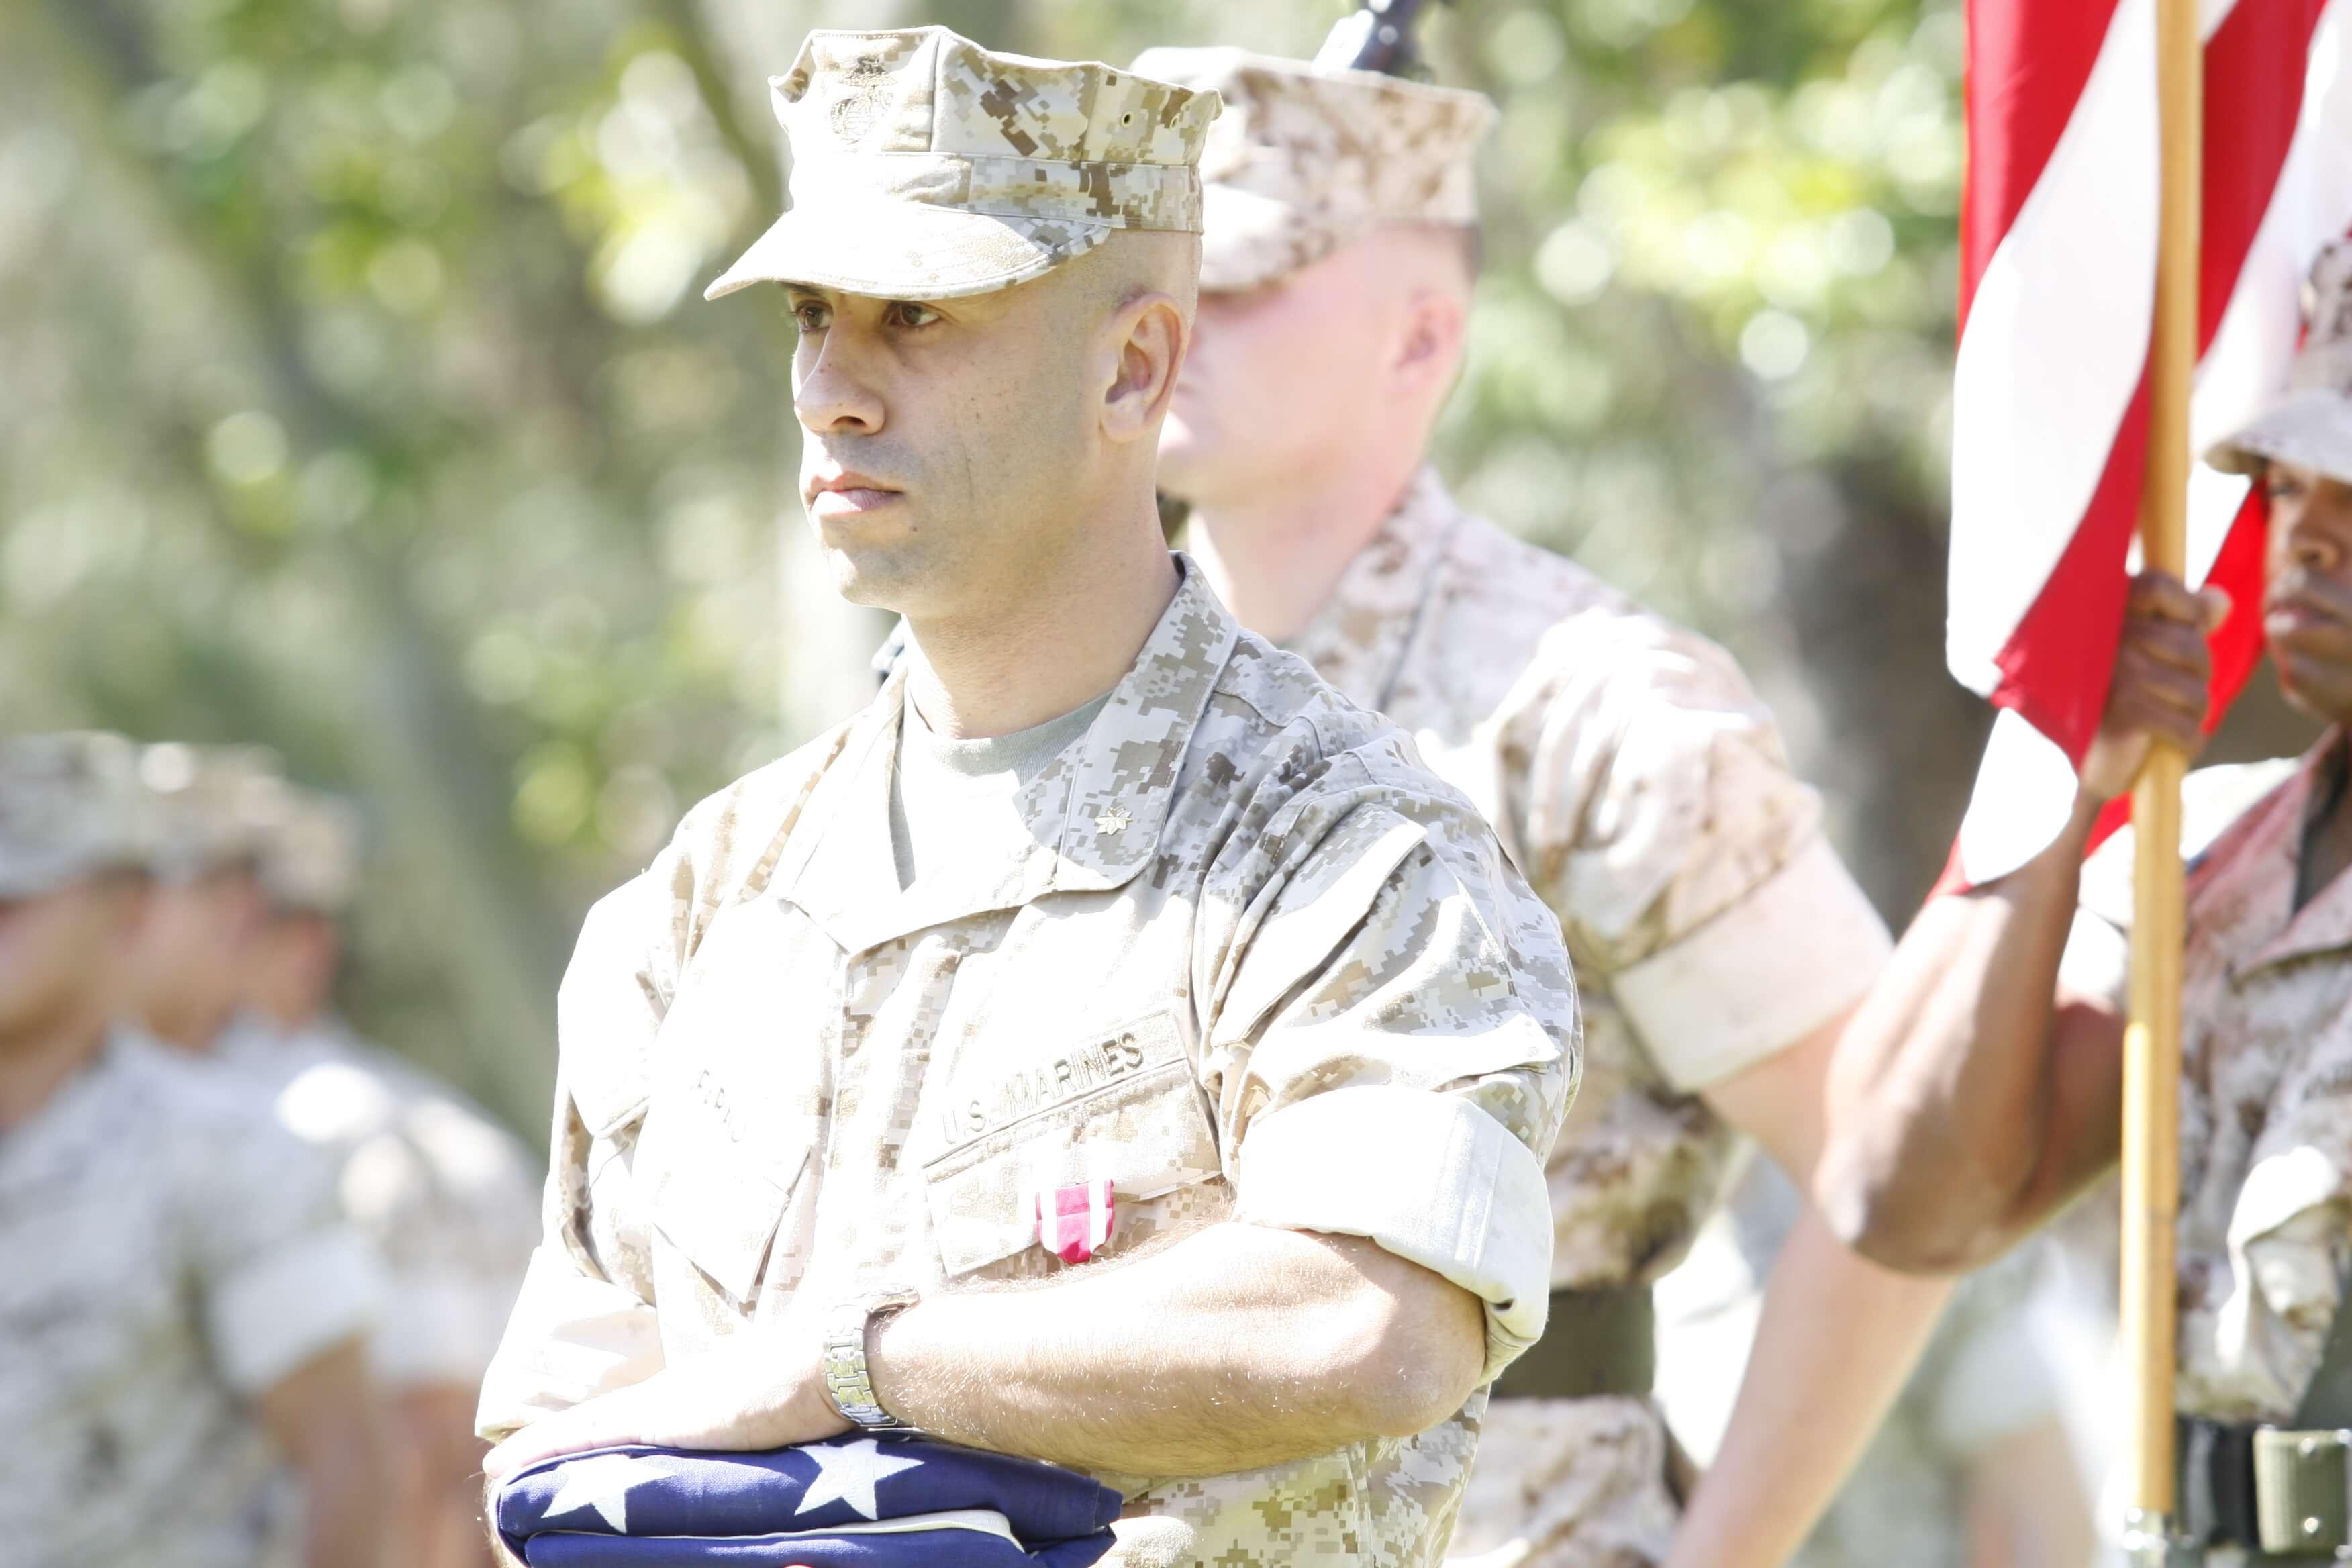 Haytham Faraj in marine attire